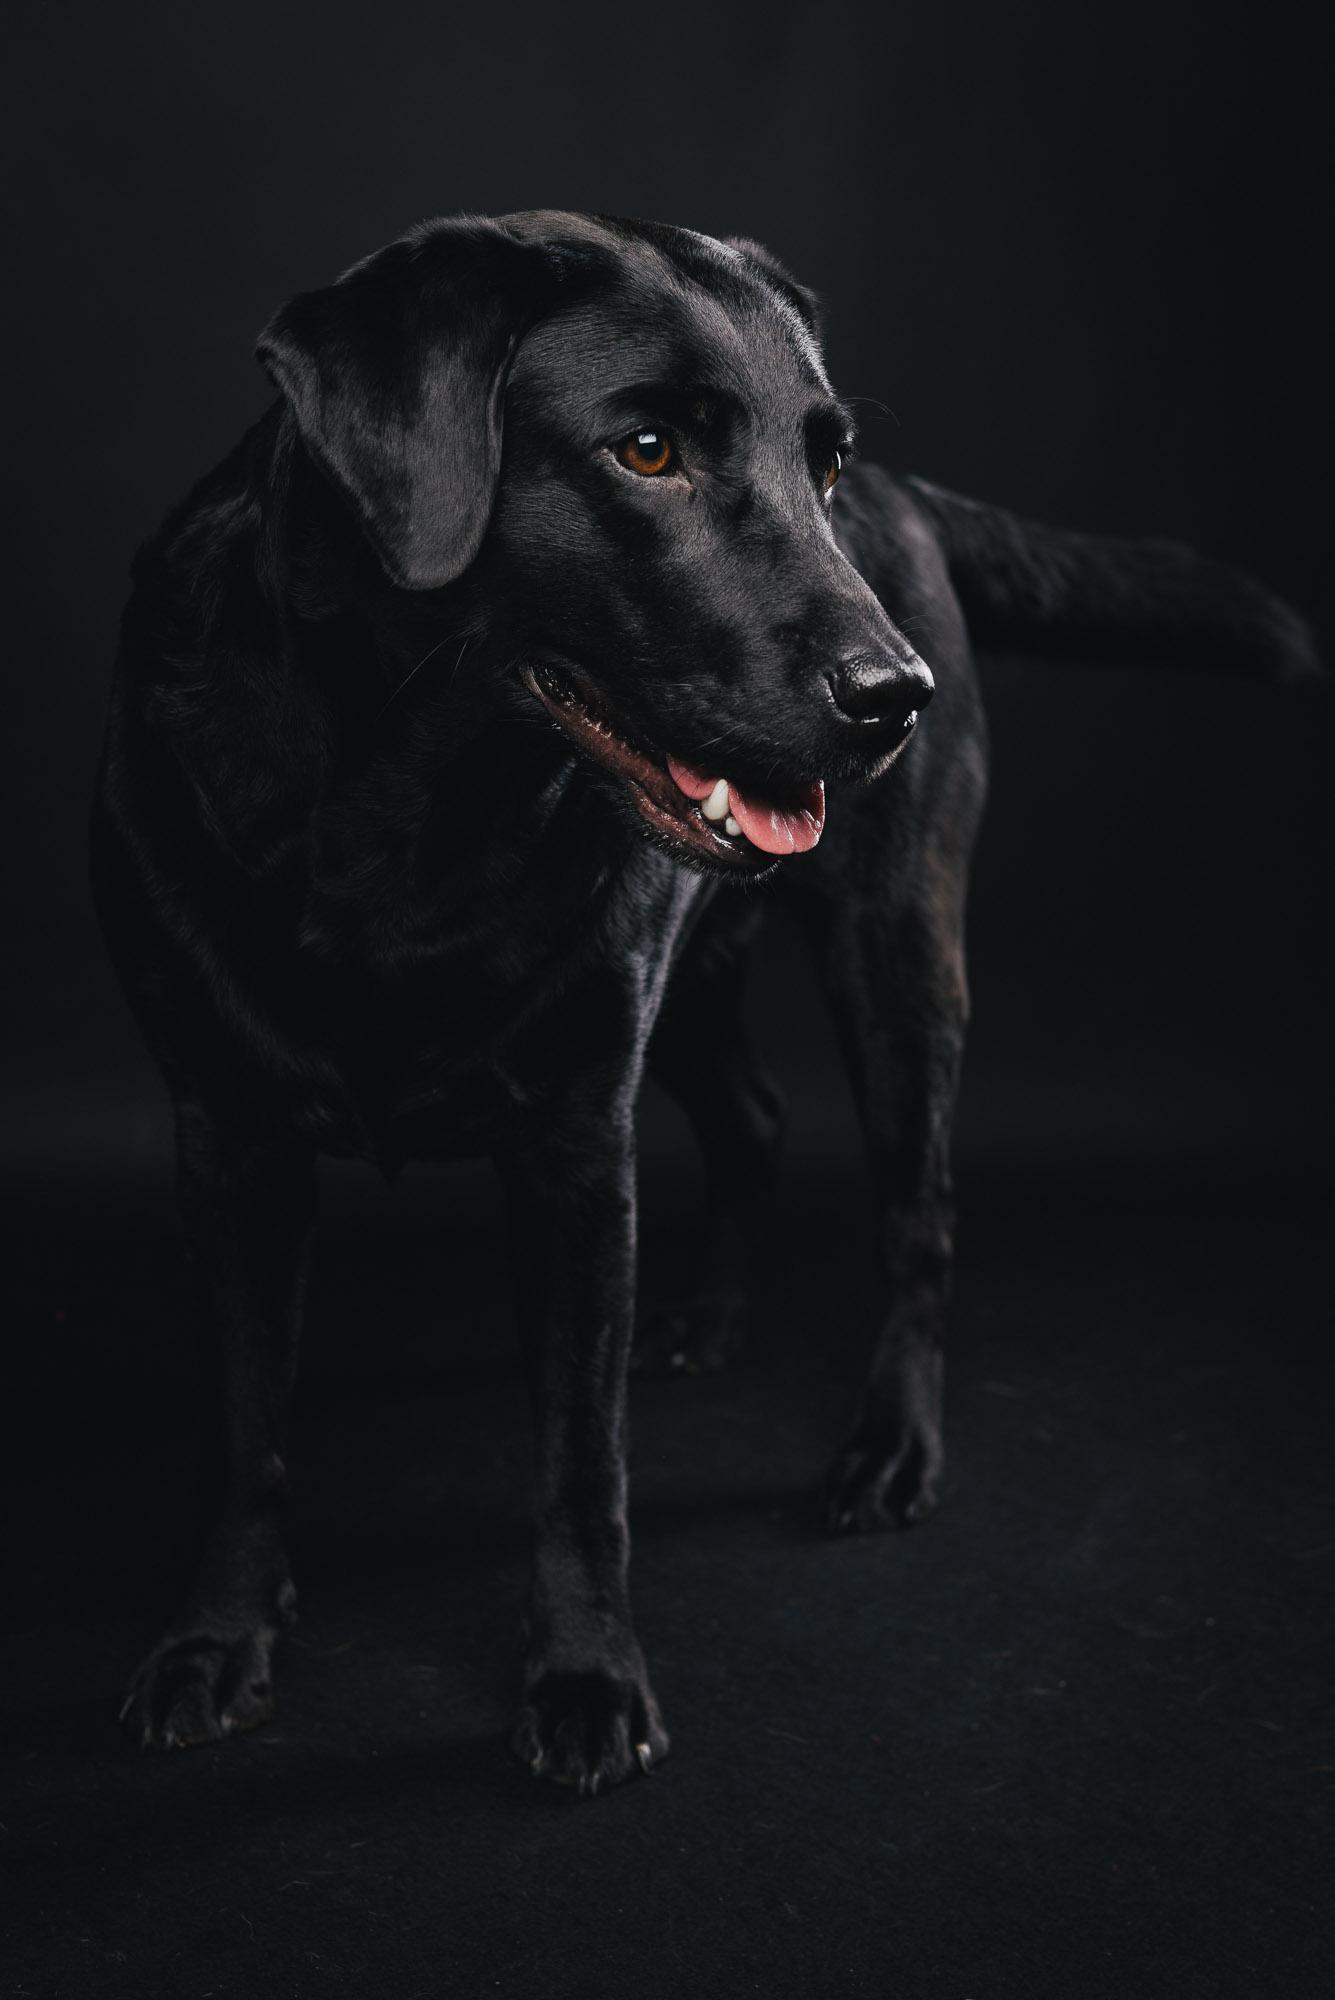 Pfotentick Hundefotografie Studio Shooting Juli